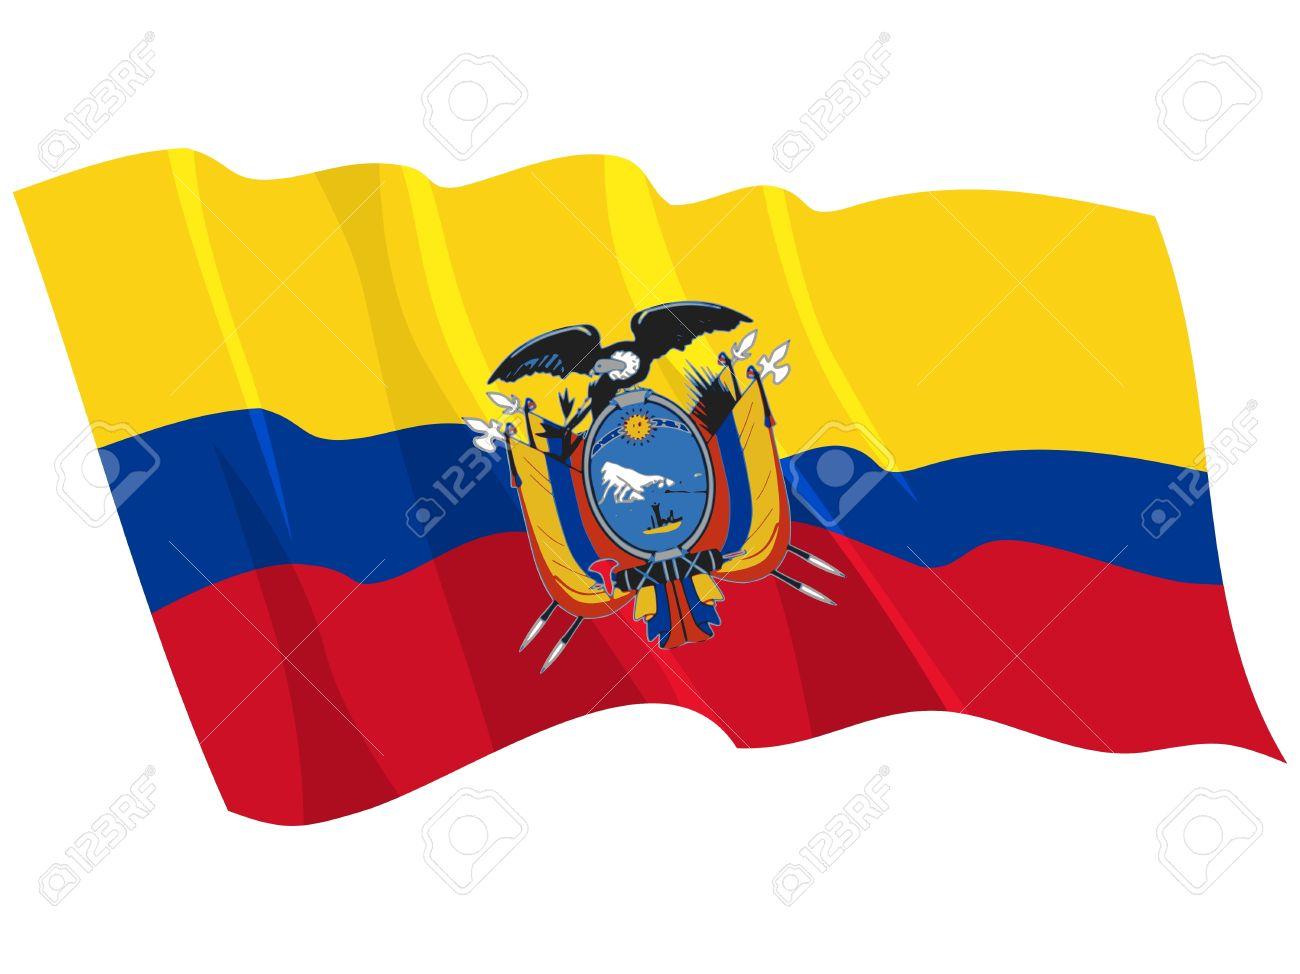 Ecuador clipart #1, Download drawings